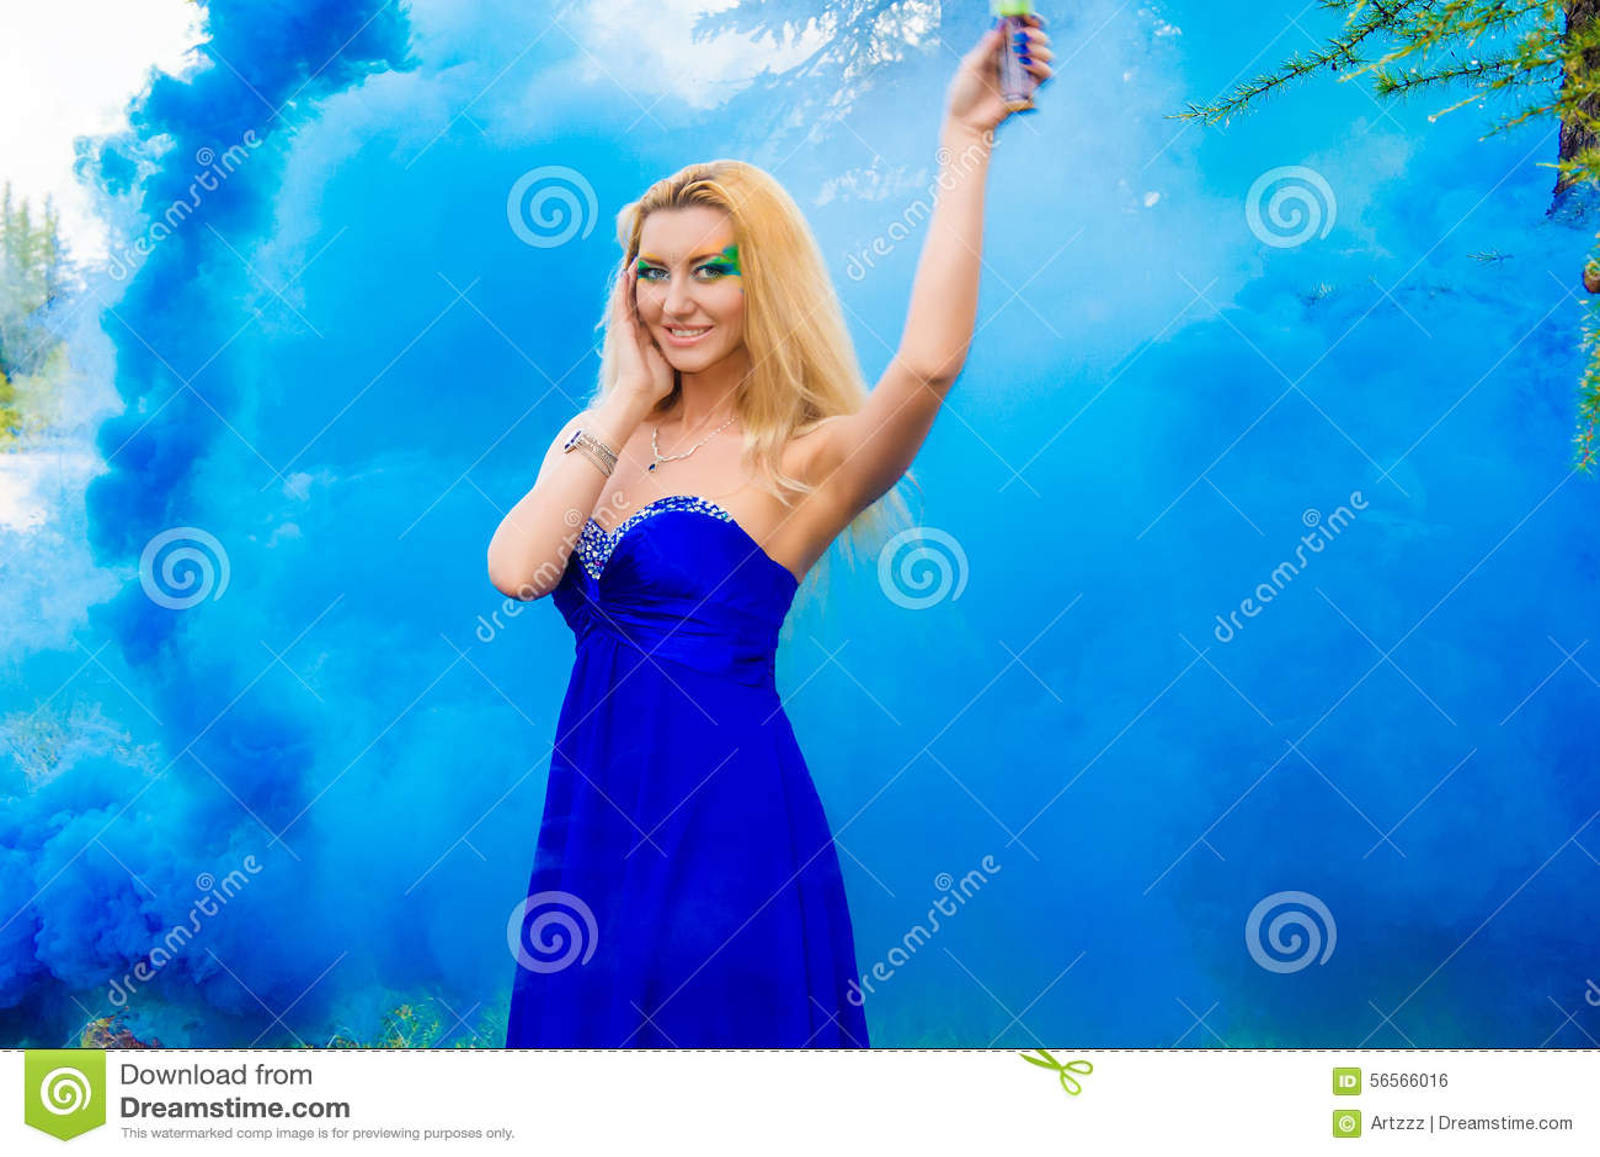 Download Όμορφη νέα γυναίκα σε ένα σύννεφο ενός φωτεινού μπλε καπνού Στοκ Εικόνες - εικόνα από ηθοποιών, κυανός: 56566016